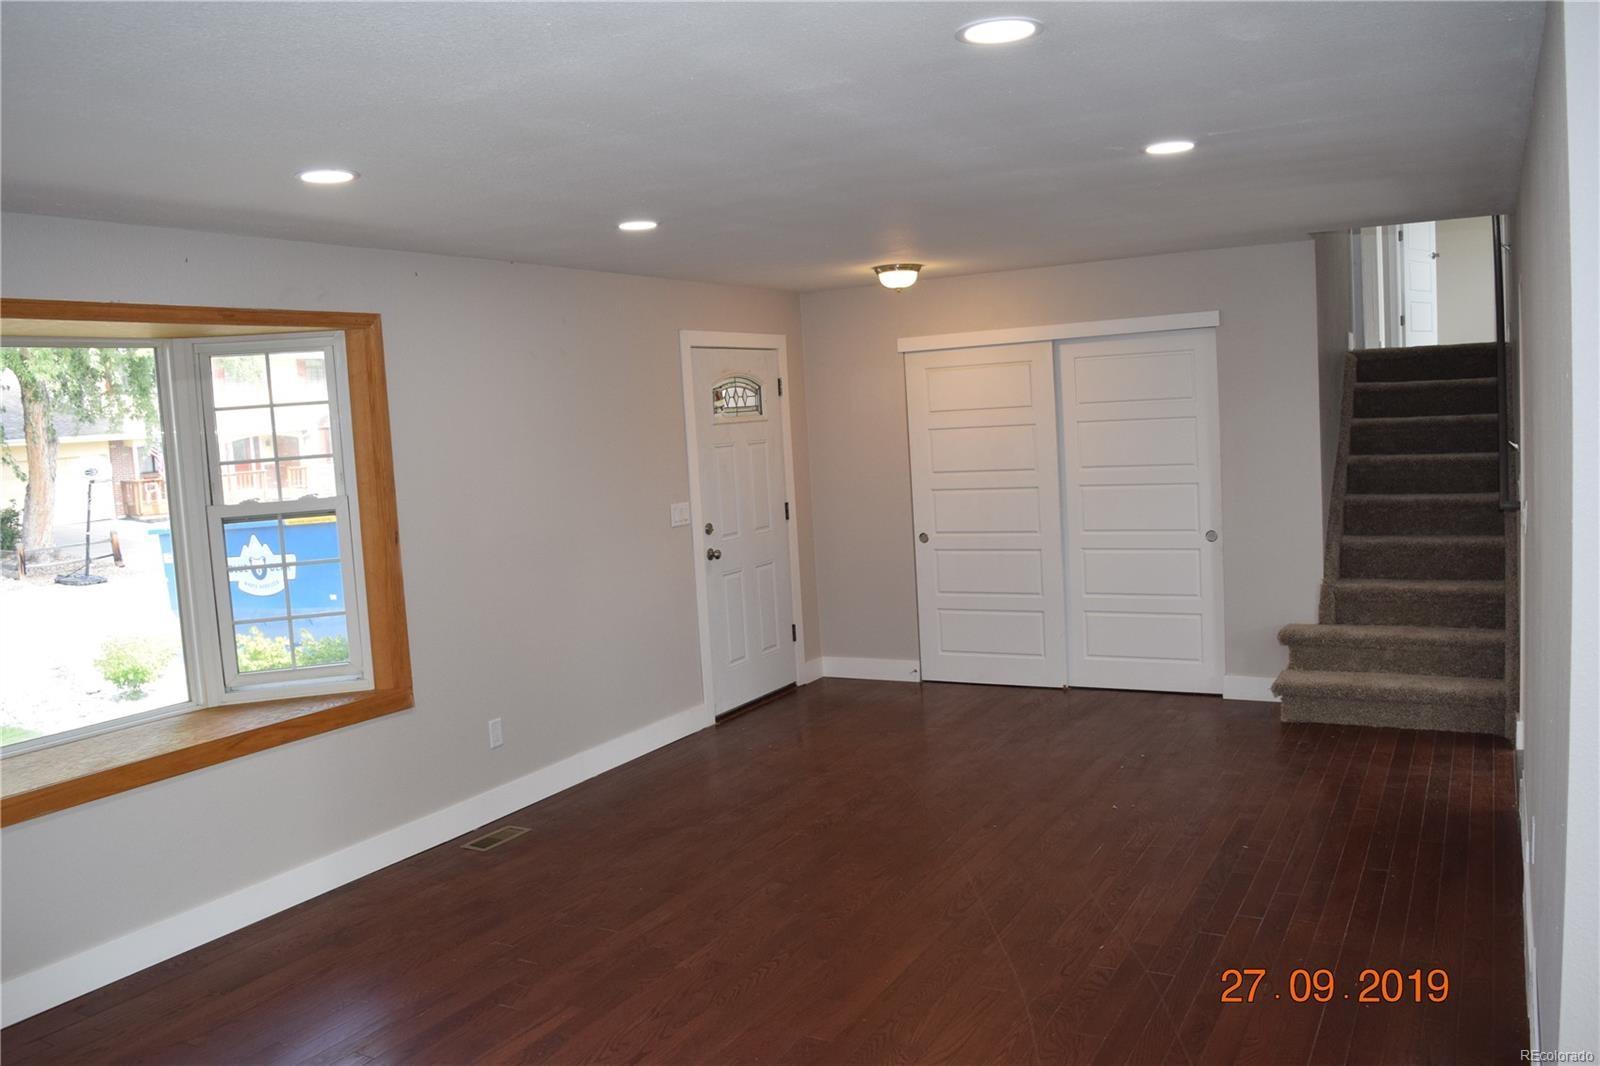 MLS# 9616472 - 9 - 8026 W Calhoun Place, Littleton, CO 80123